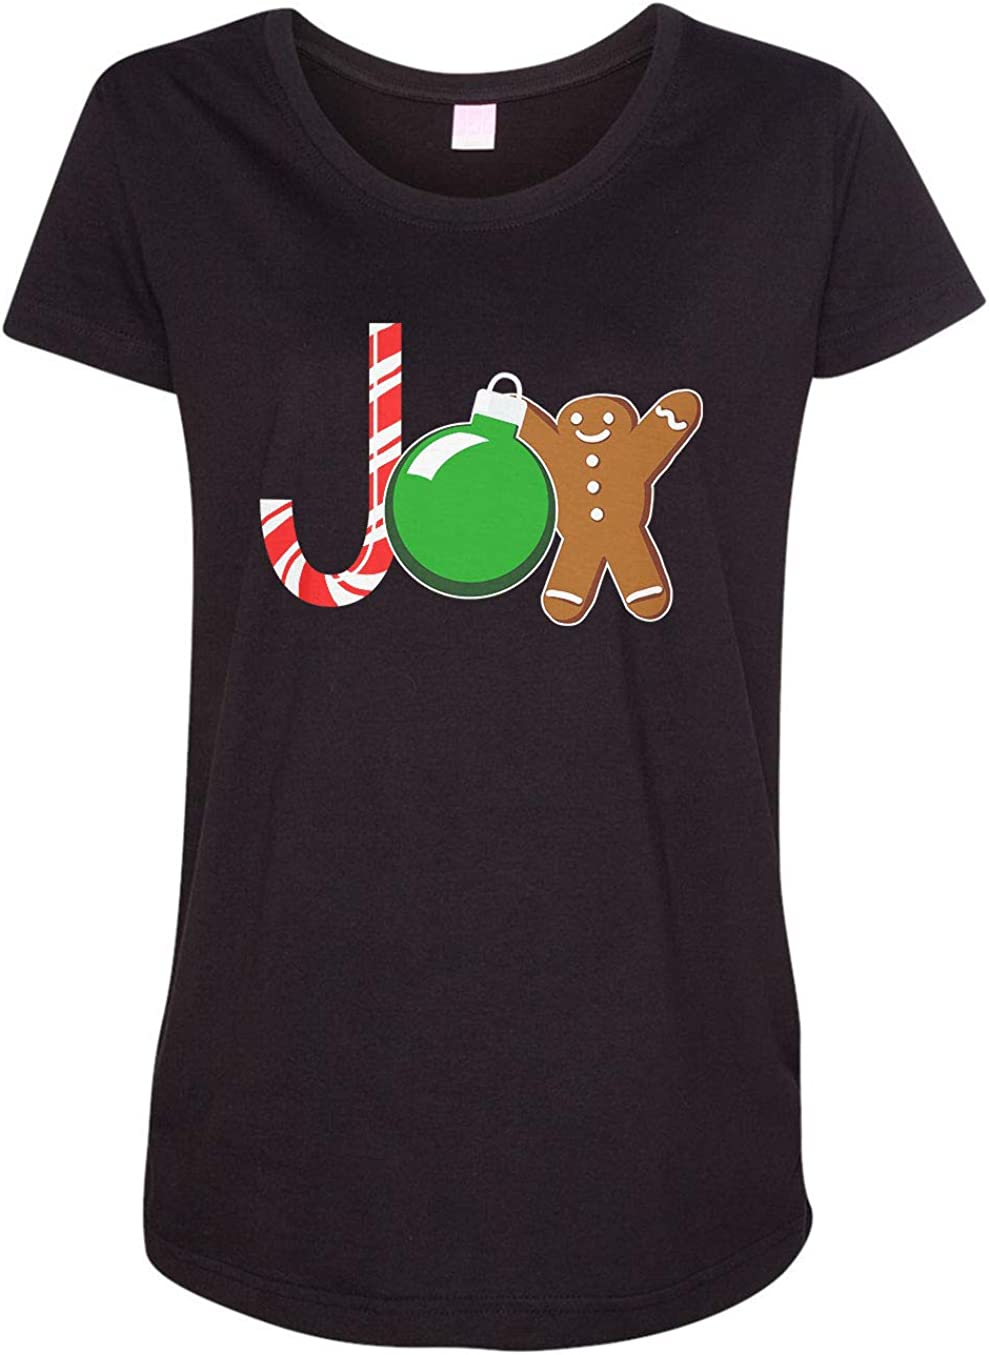 HARD EDGE DESIGN Women's Joy T-Shirt